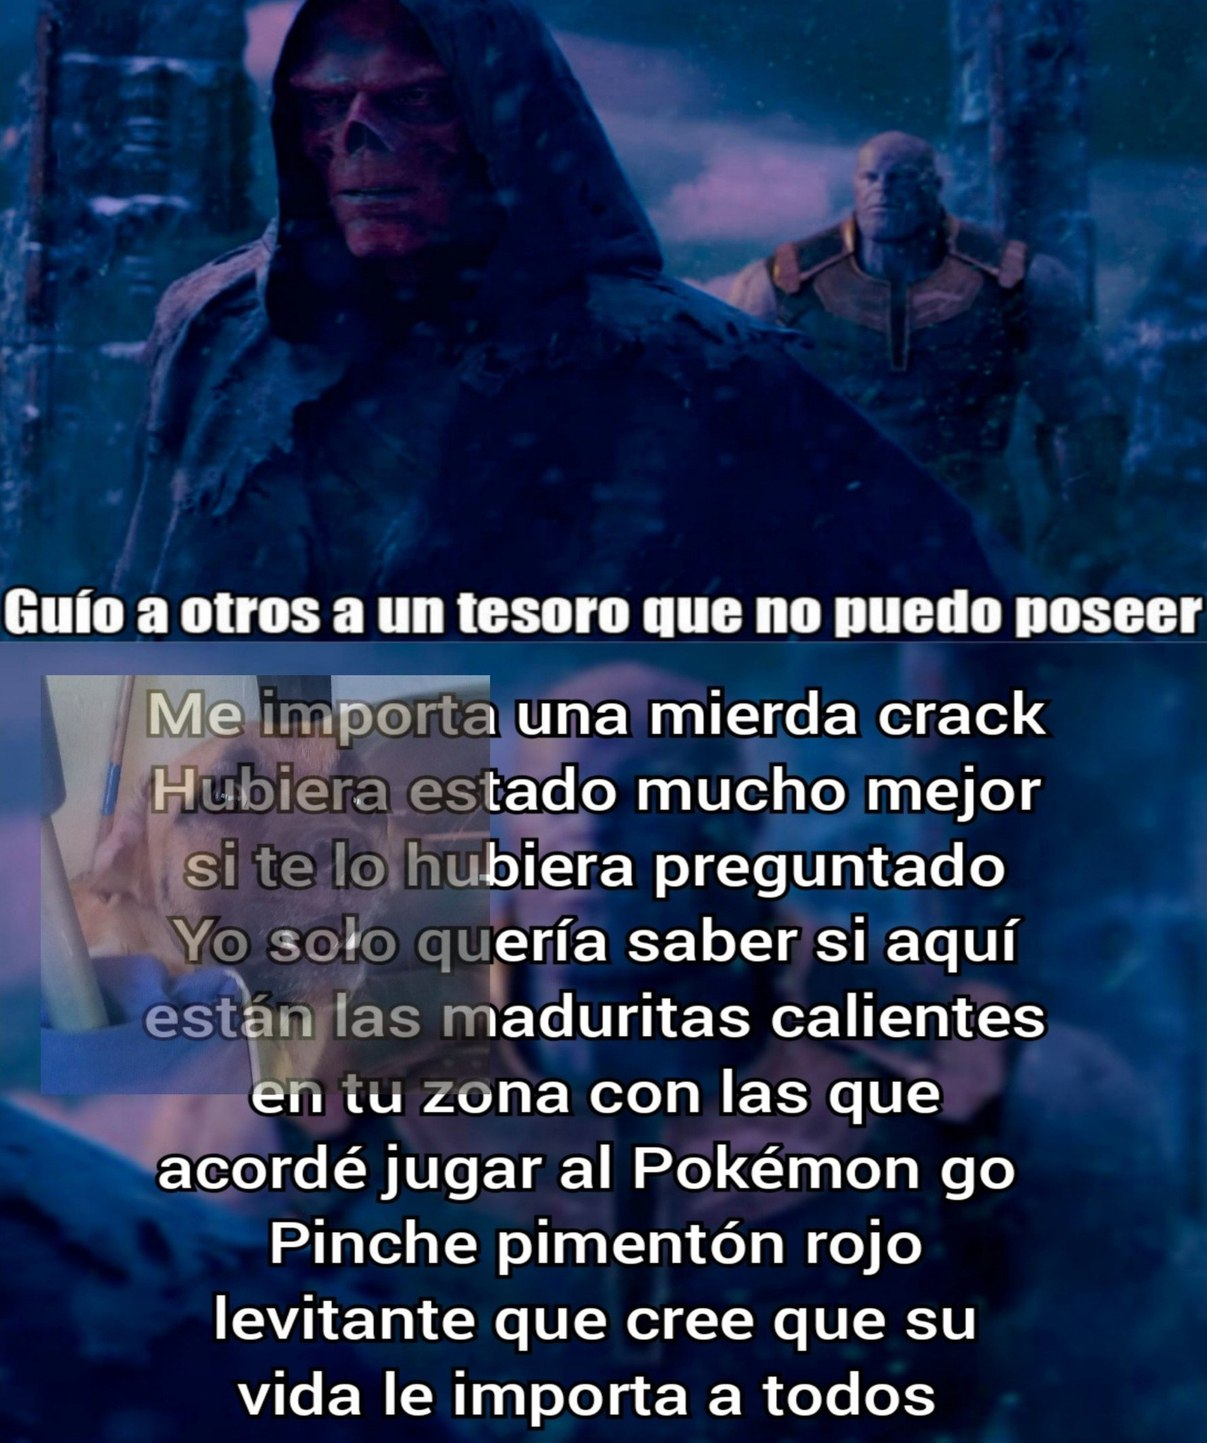 Pimentón rojo - meme